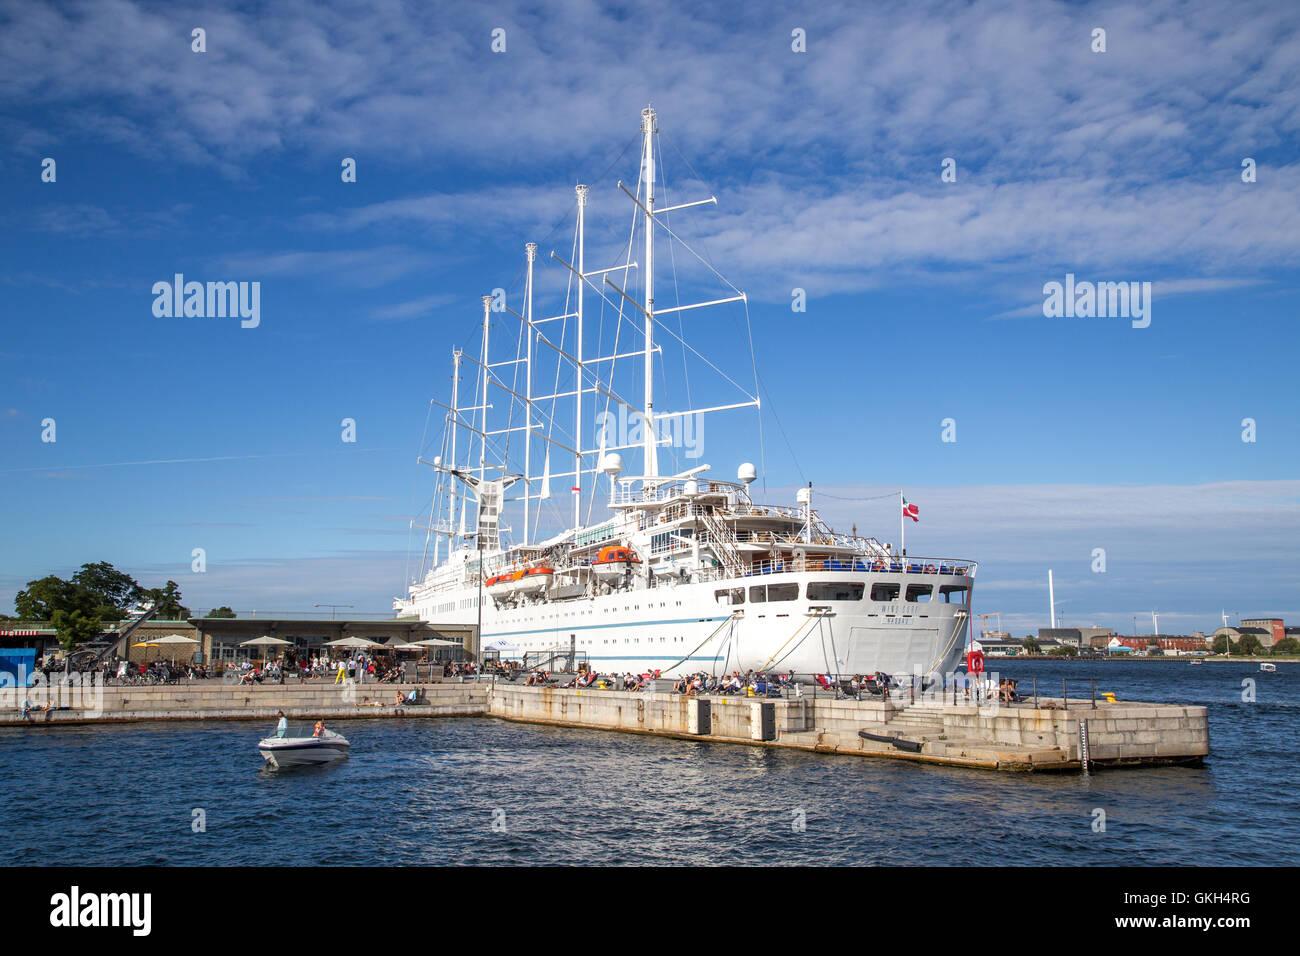 Copenhagen, Denmark - August 17, 2016: Cruise ship Wind Surf anchored in Copenhagen harbour Stock Photo